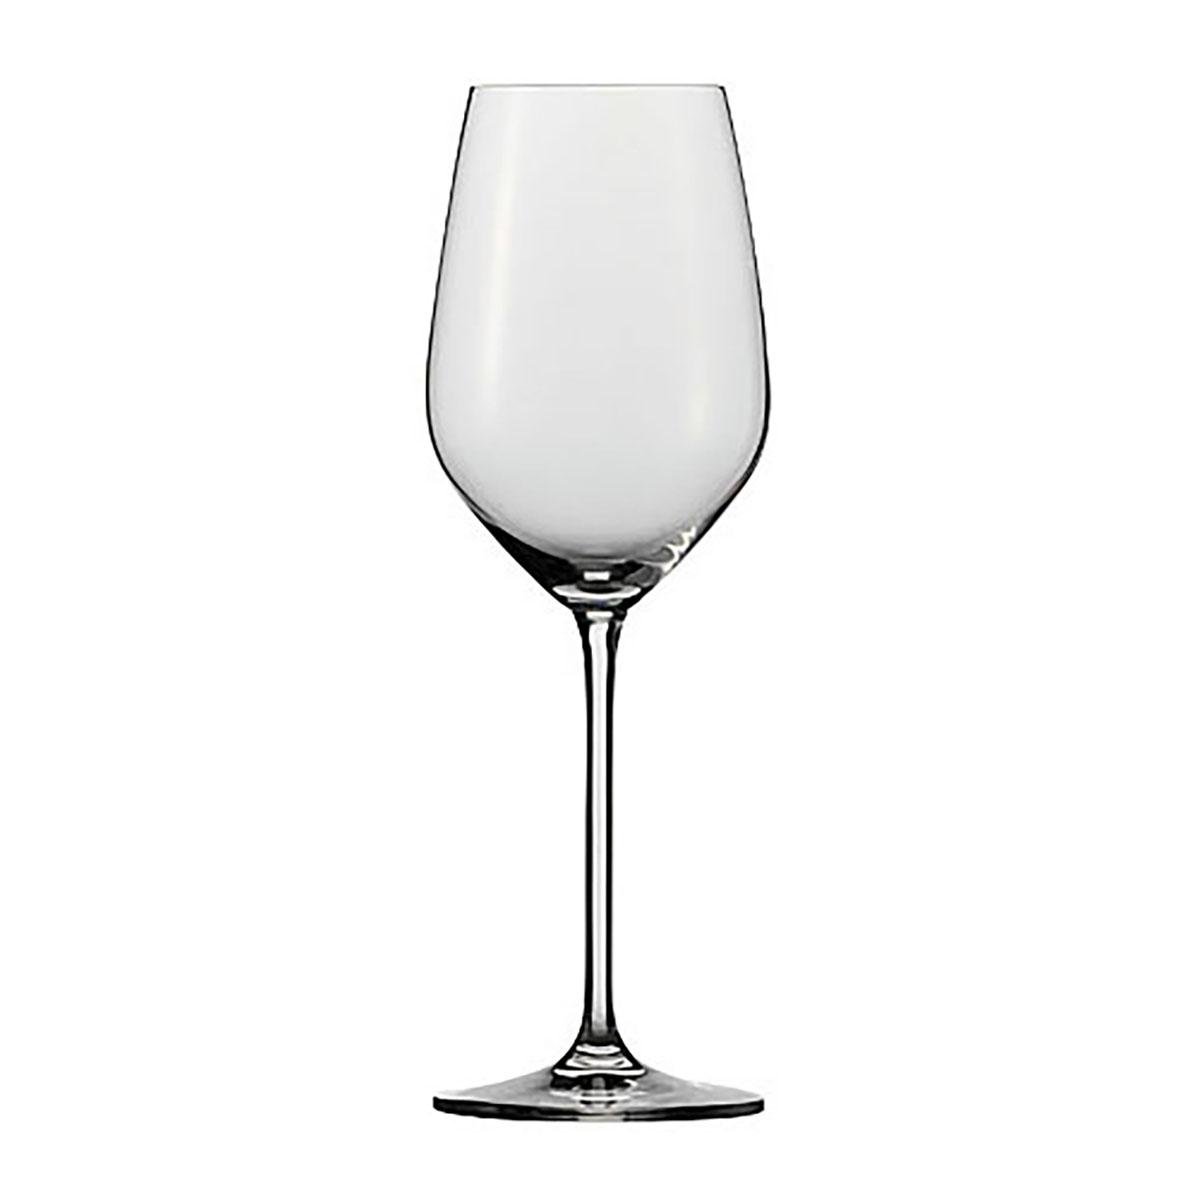 Schott Zwiesel Tritan Fortissimo Wine Goblet, Set of Six